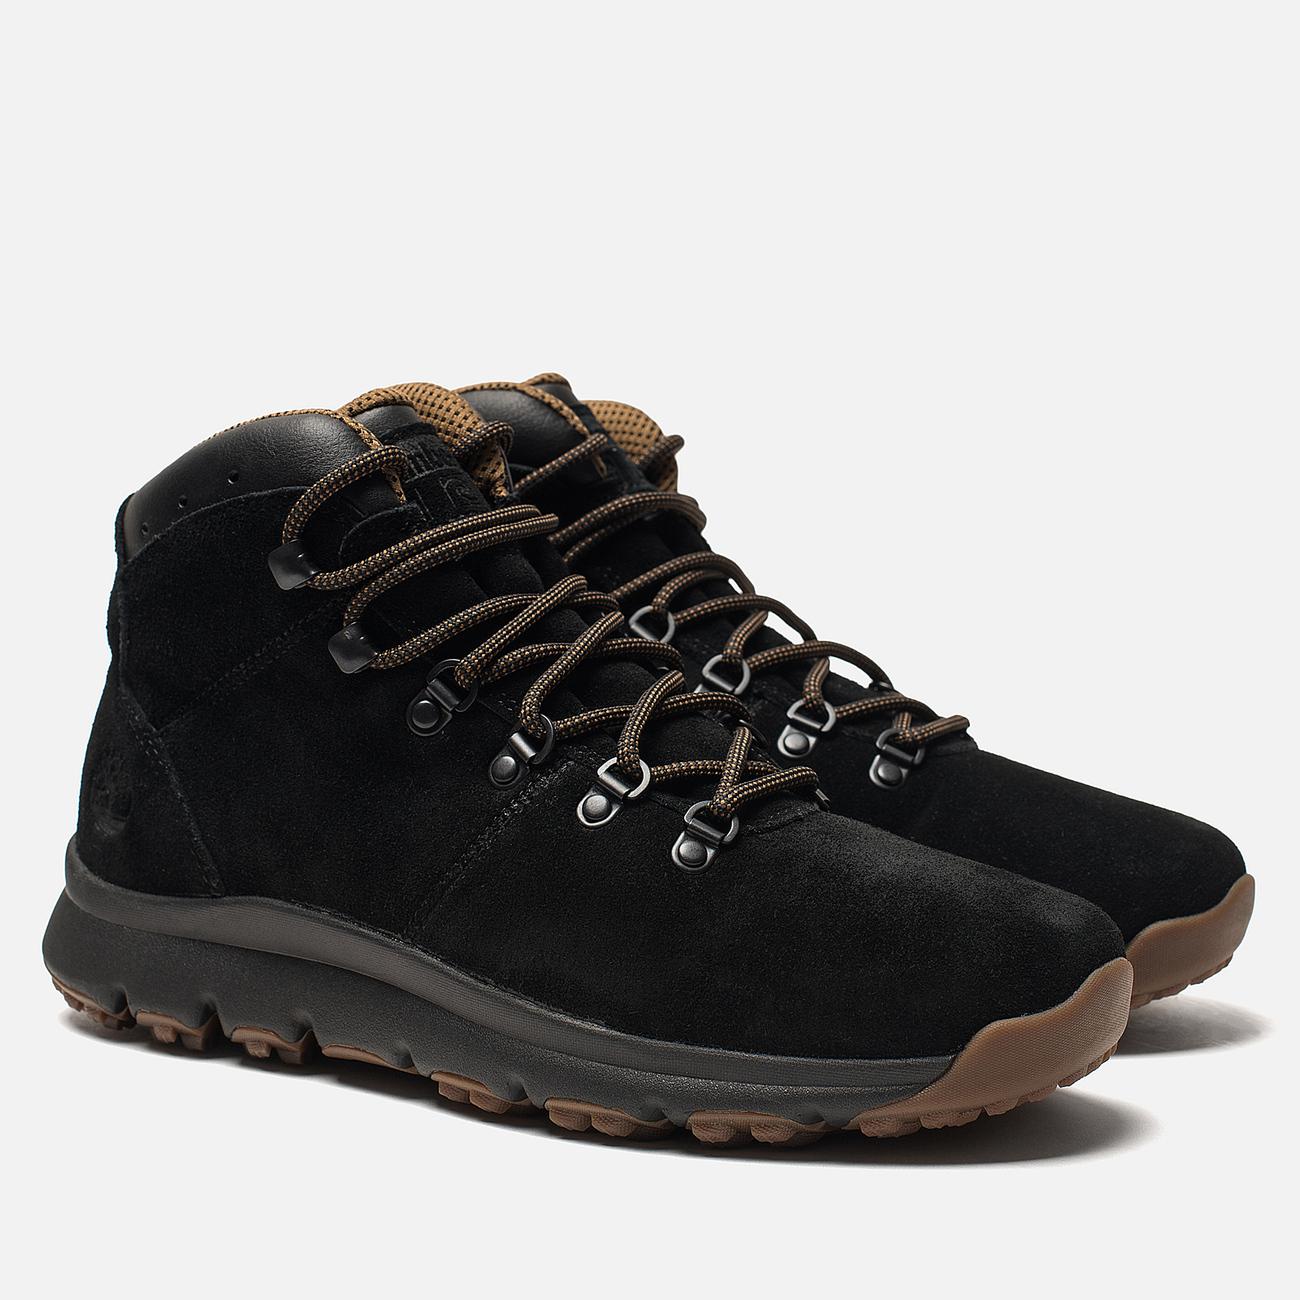 Мужские ботинки Timberland World Hiker Mid Black/Brown